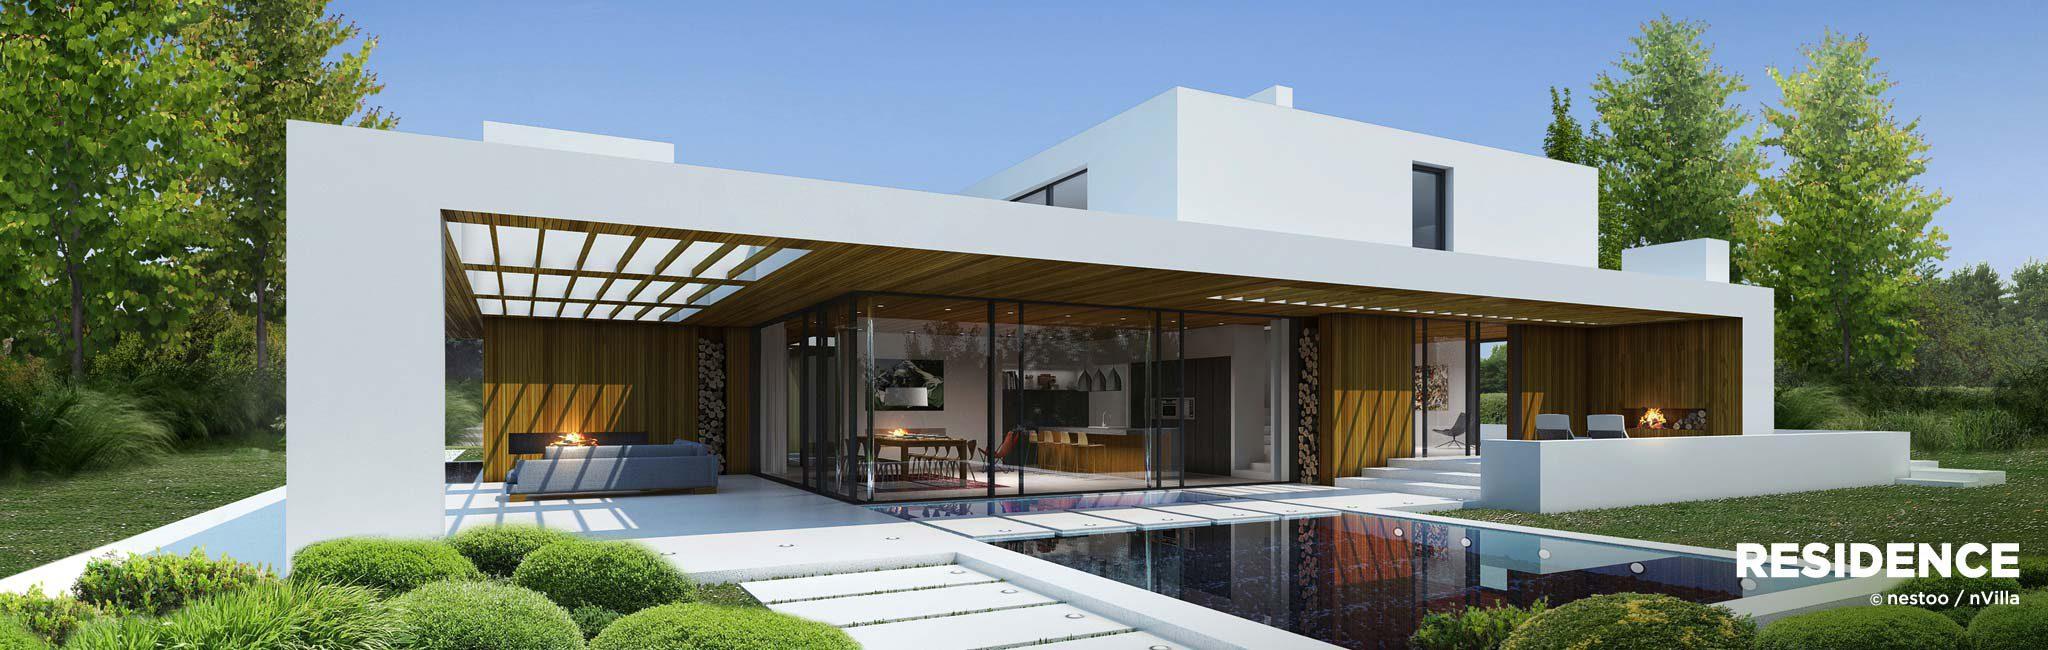 Nvilla residence nestoo for Villa moderne 2016